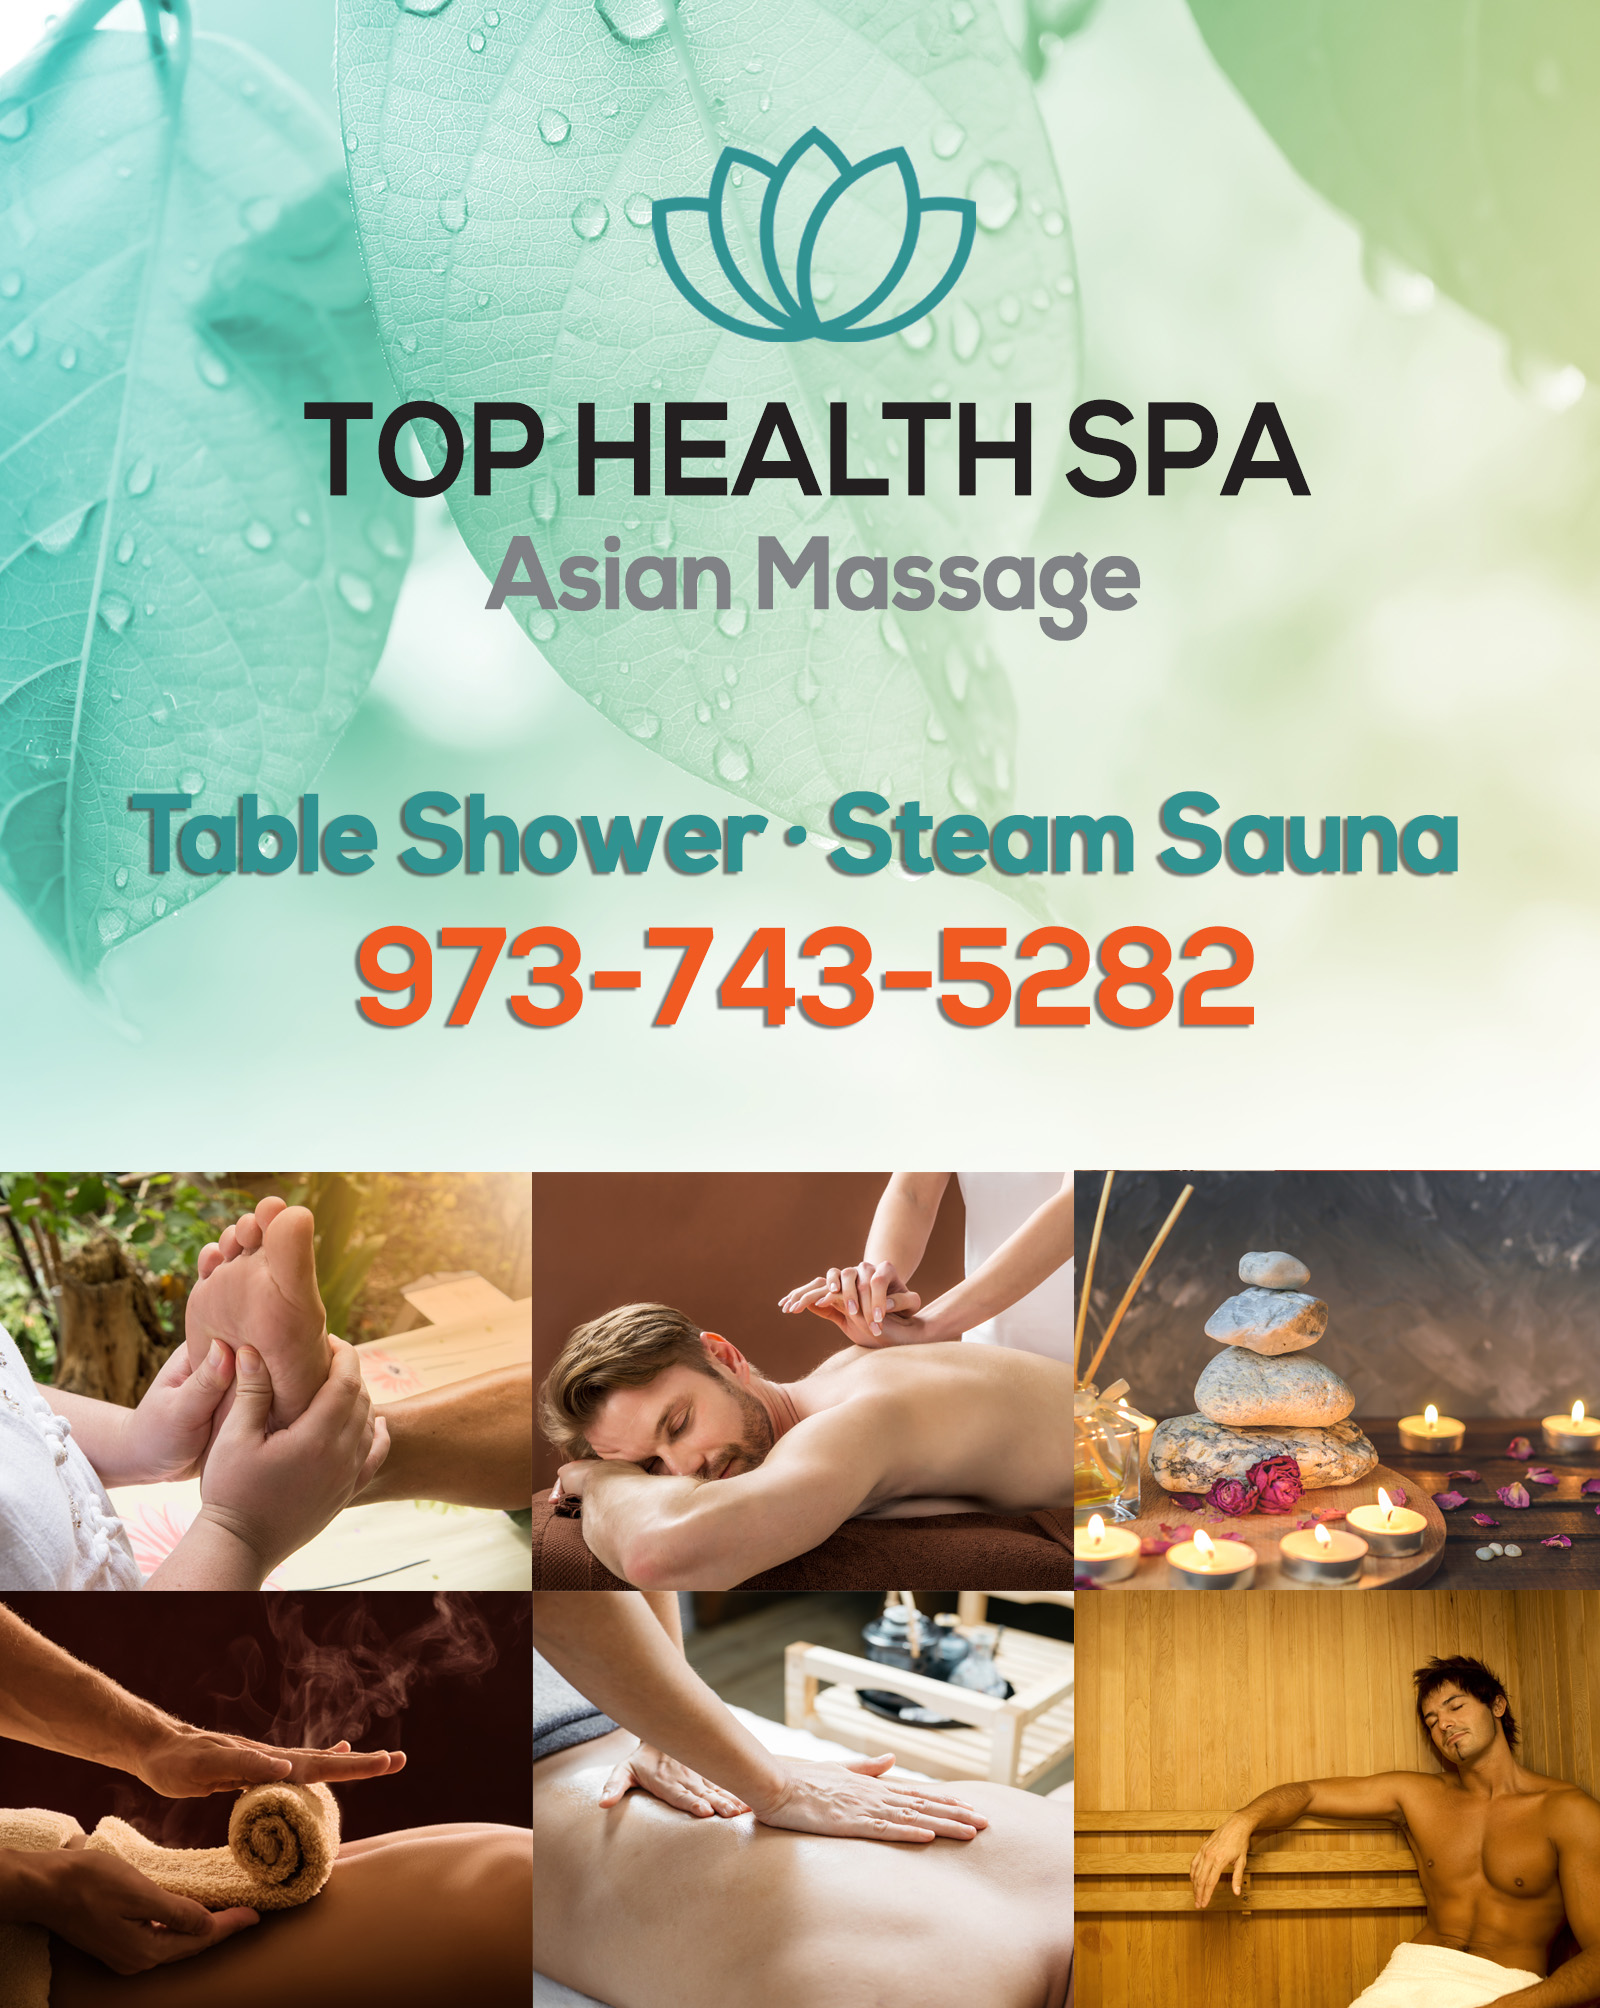 Table Shower Massage Nyc : table, shower, massage, Massage, Local, Search, OMGPAGE.COM, Health